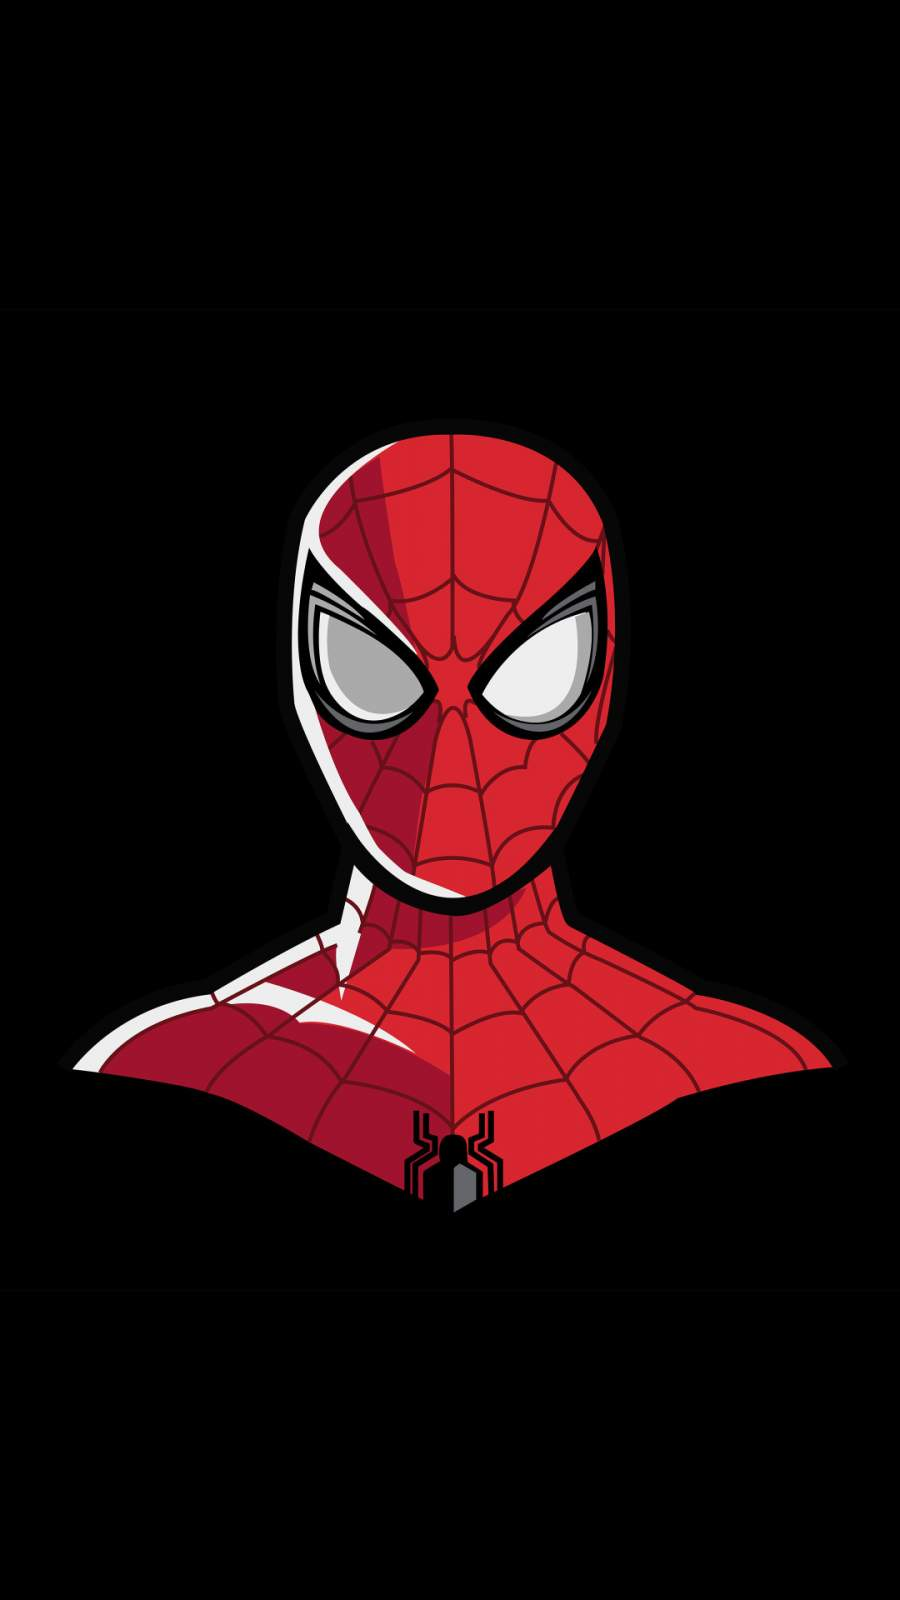 Spiderman 4k Minimal iPhone Wallpaper